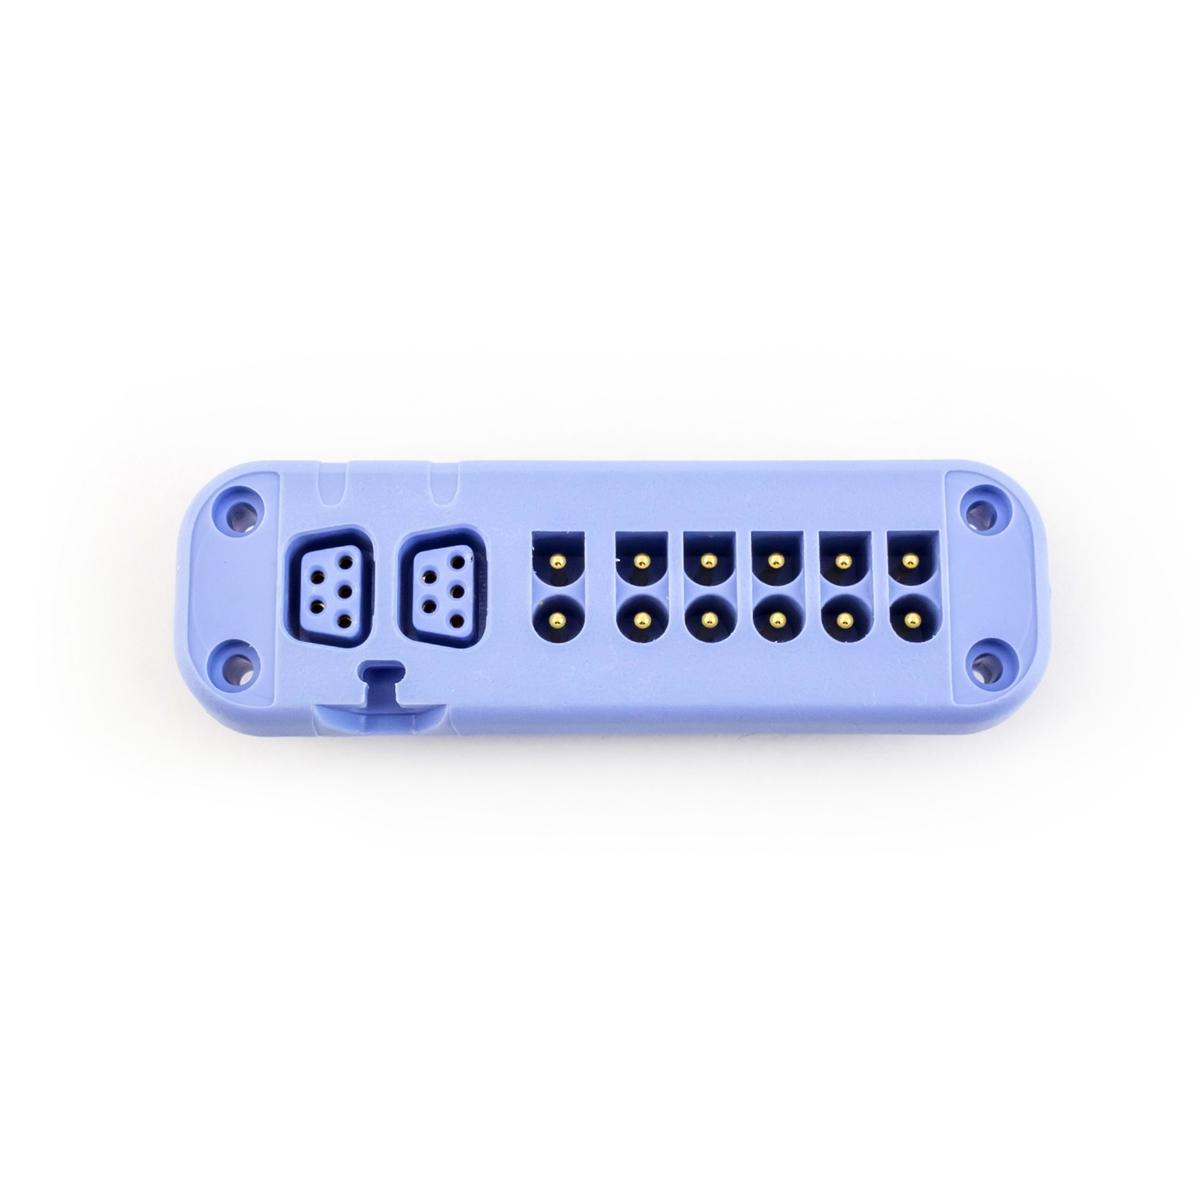 GE ApexPro CH Telemetry Transmitter ECG Lead Wire Block